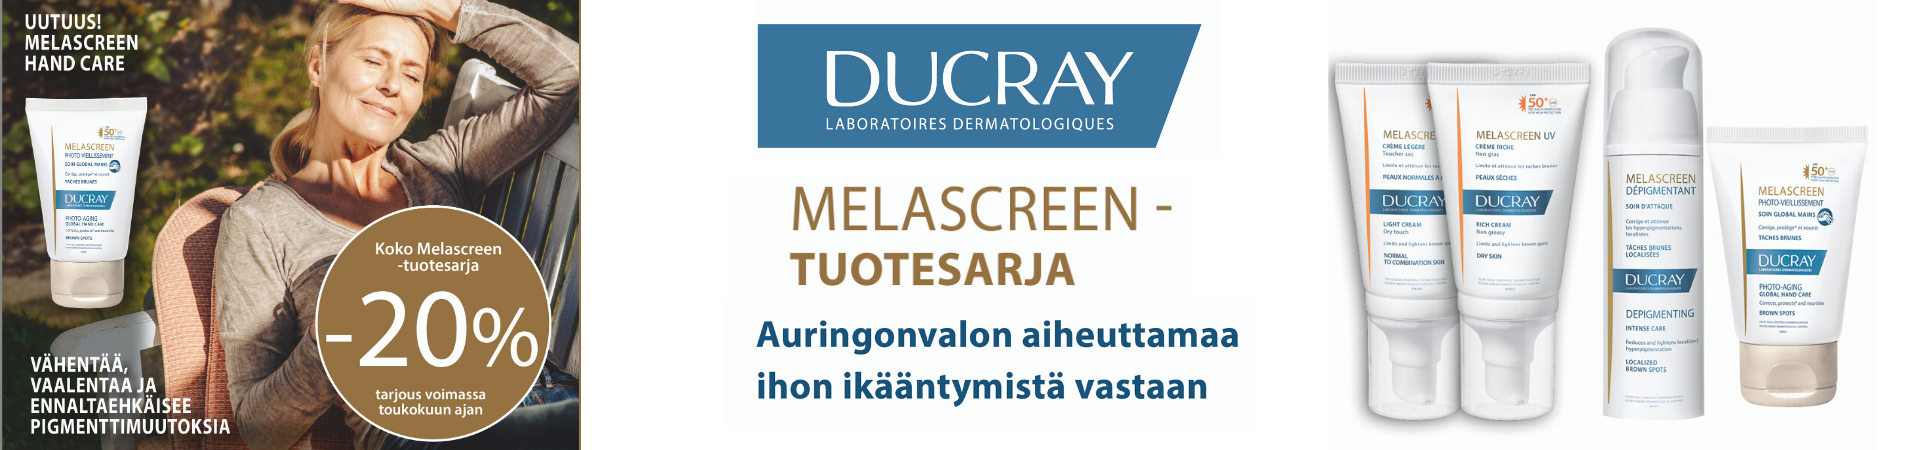 Ducray Melascreen tarjous toukokuu 2020